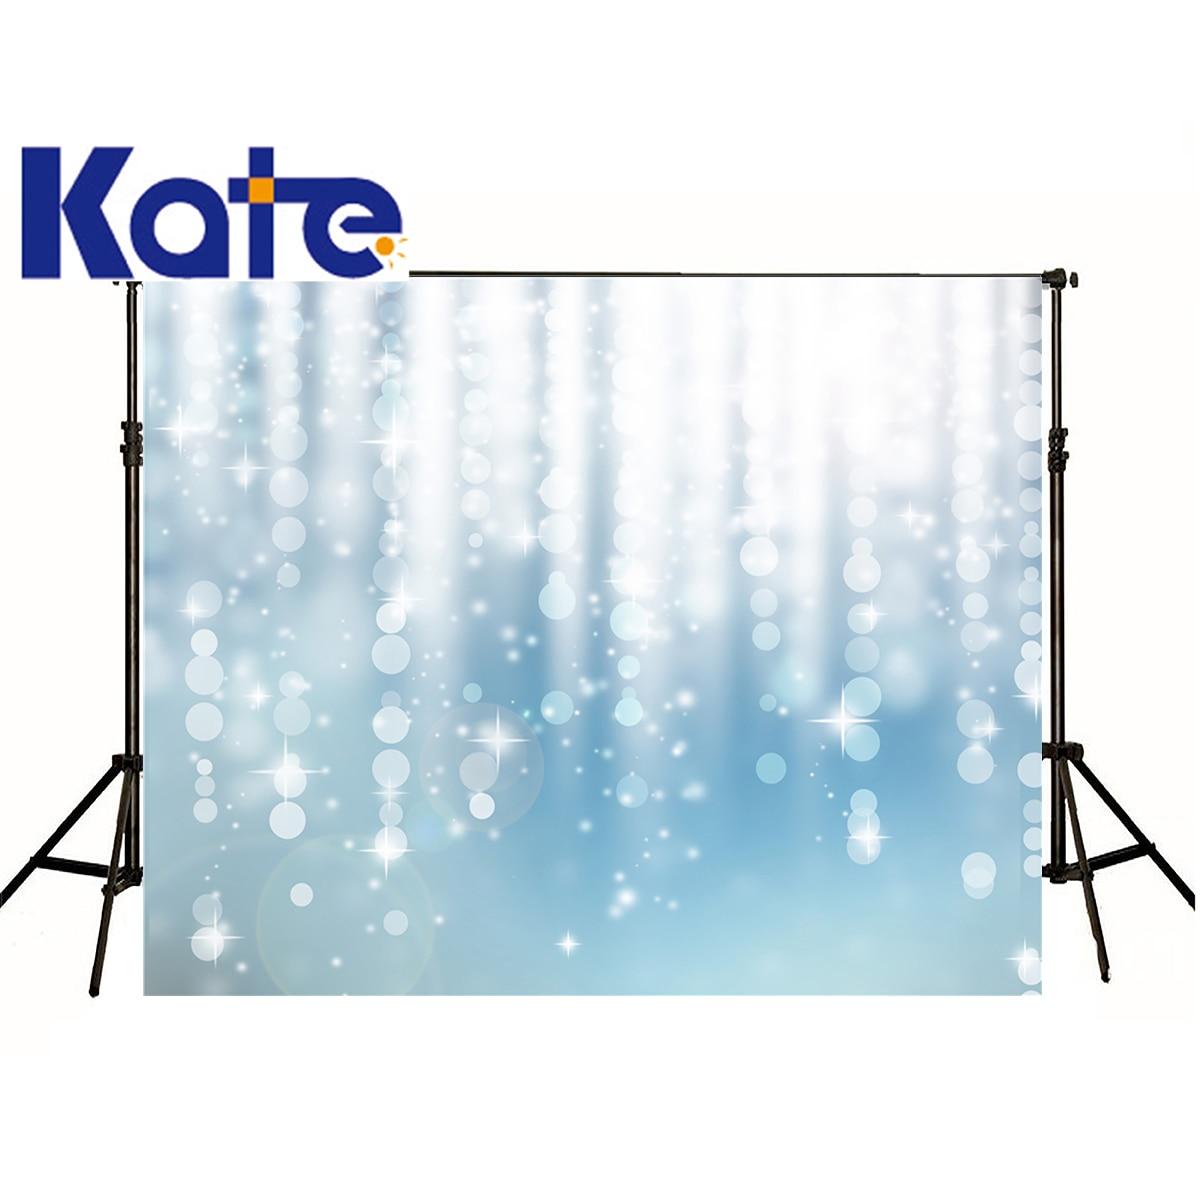 kate Photographic background Halo shining sky blue circle pattern props fabricbackdrops christmas wedding 8x12ft blue sky чаша северный олень